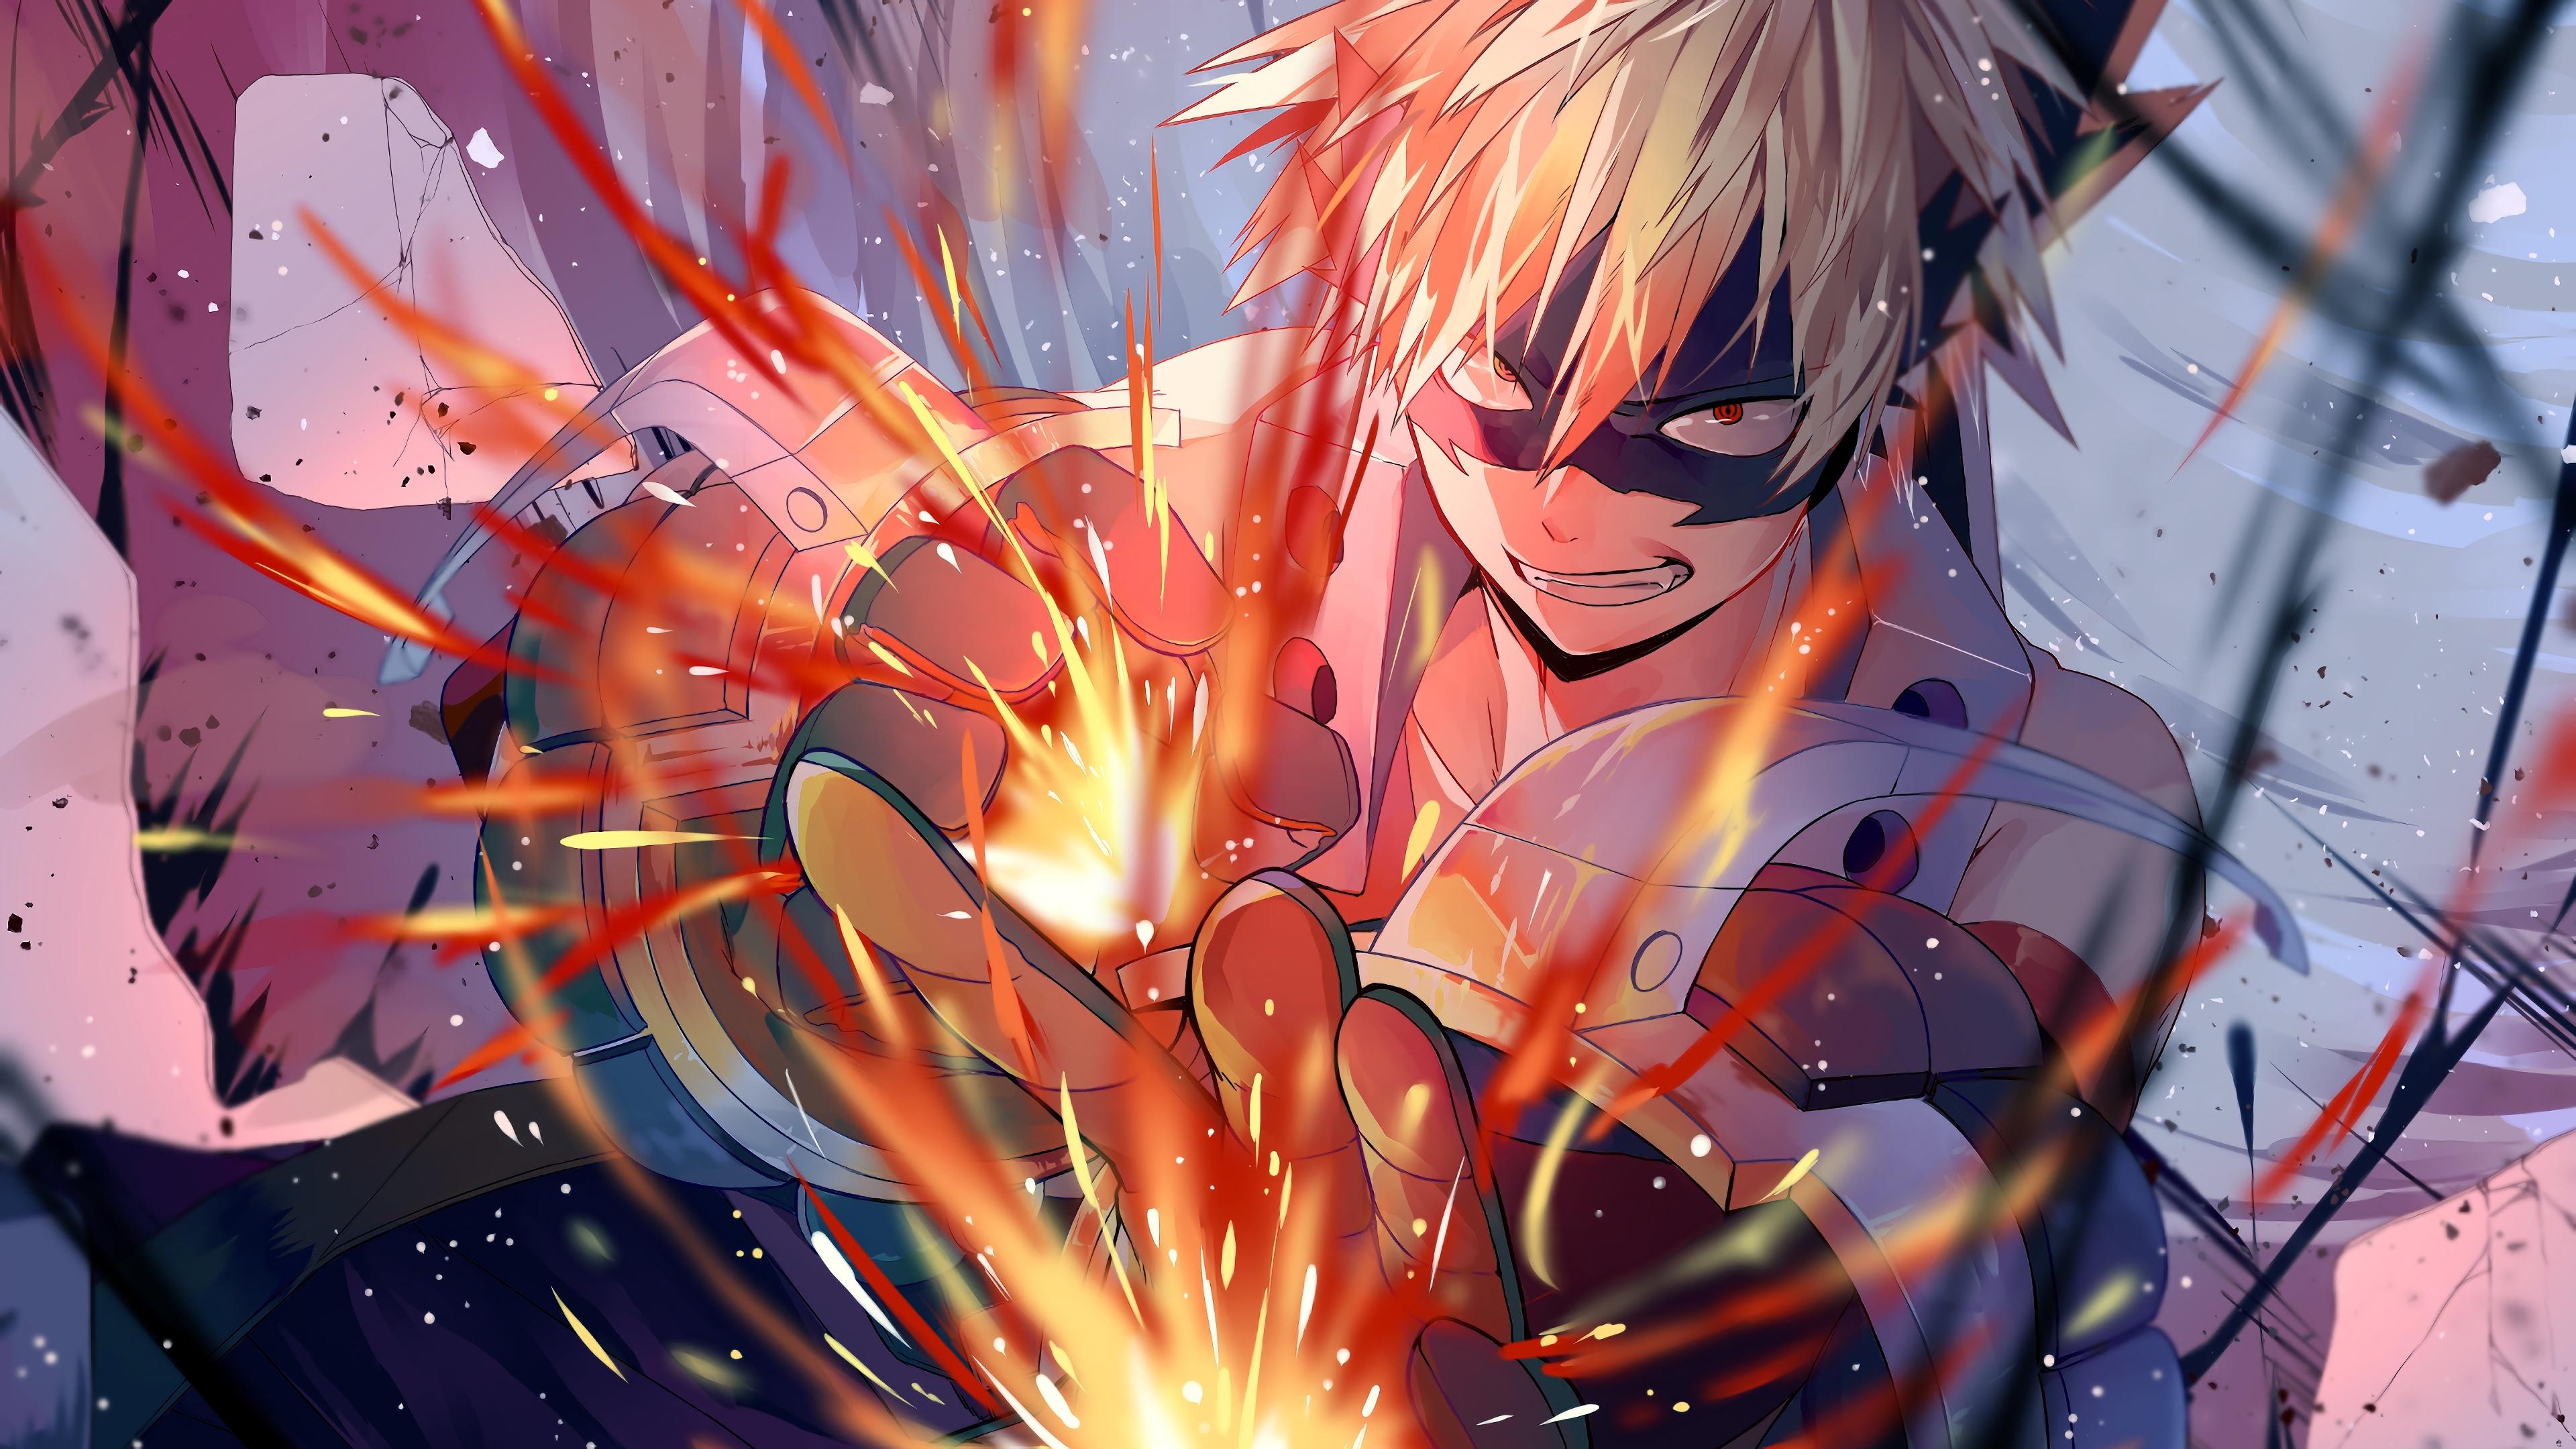 Katsuki Bakugou My Hero Academic 4k, HD Anime, 4k ...